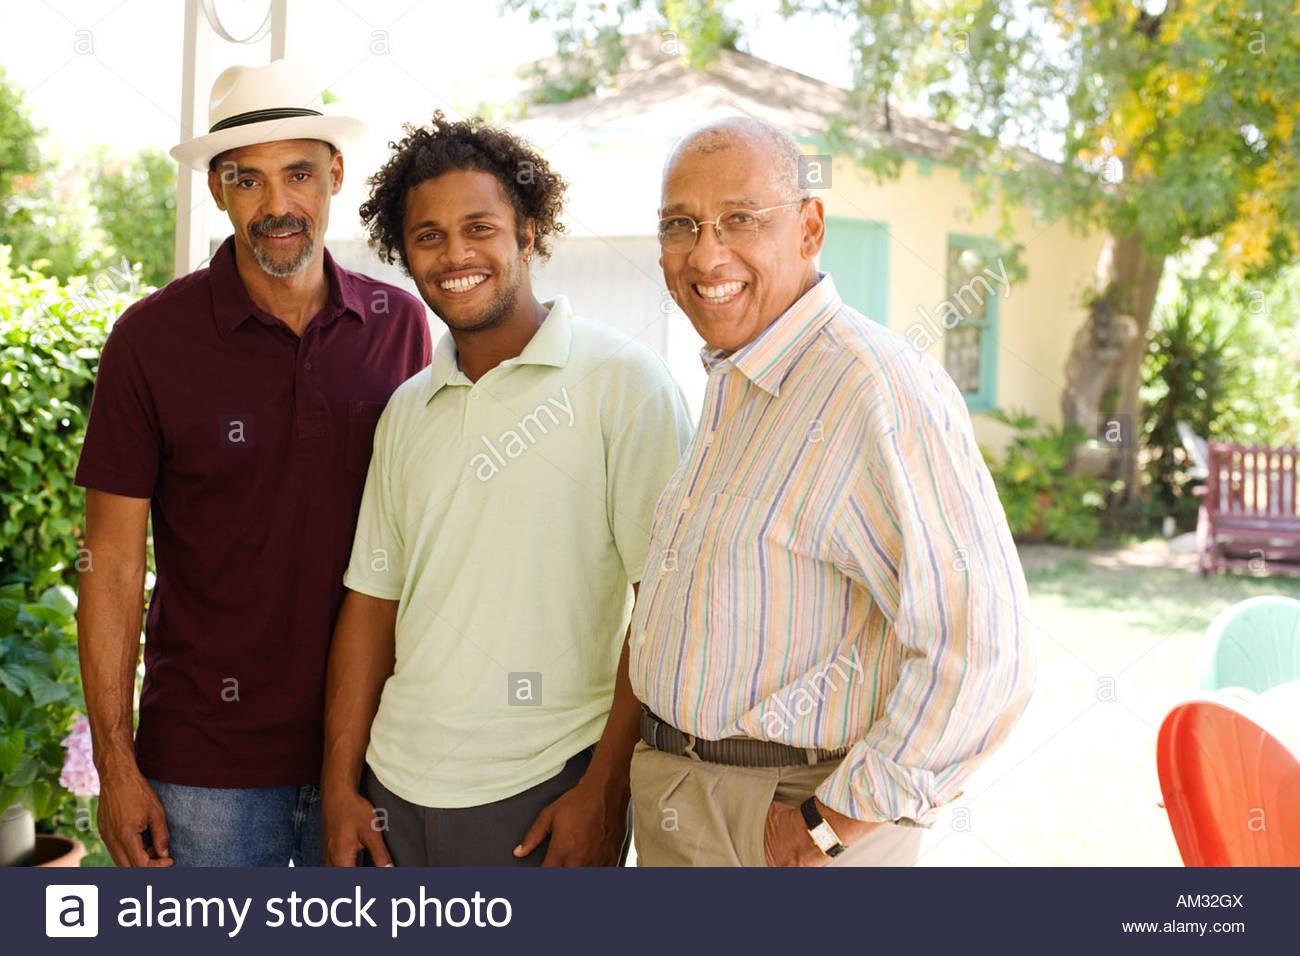 Three men outdoors on patio smiling - Stock Image